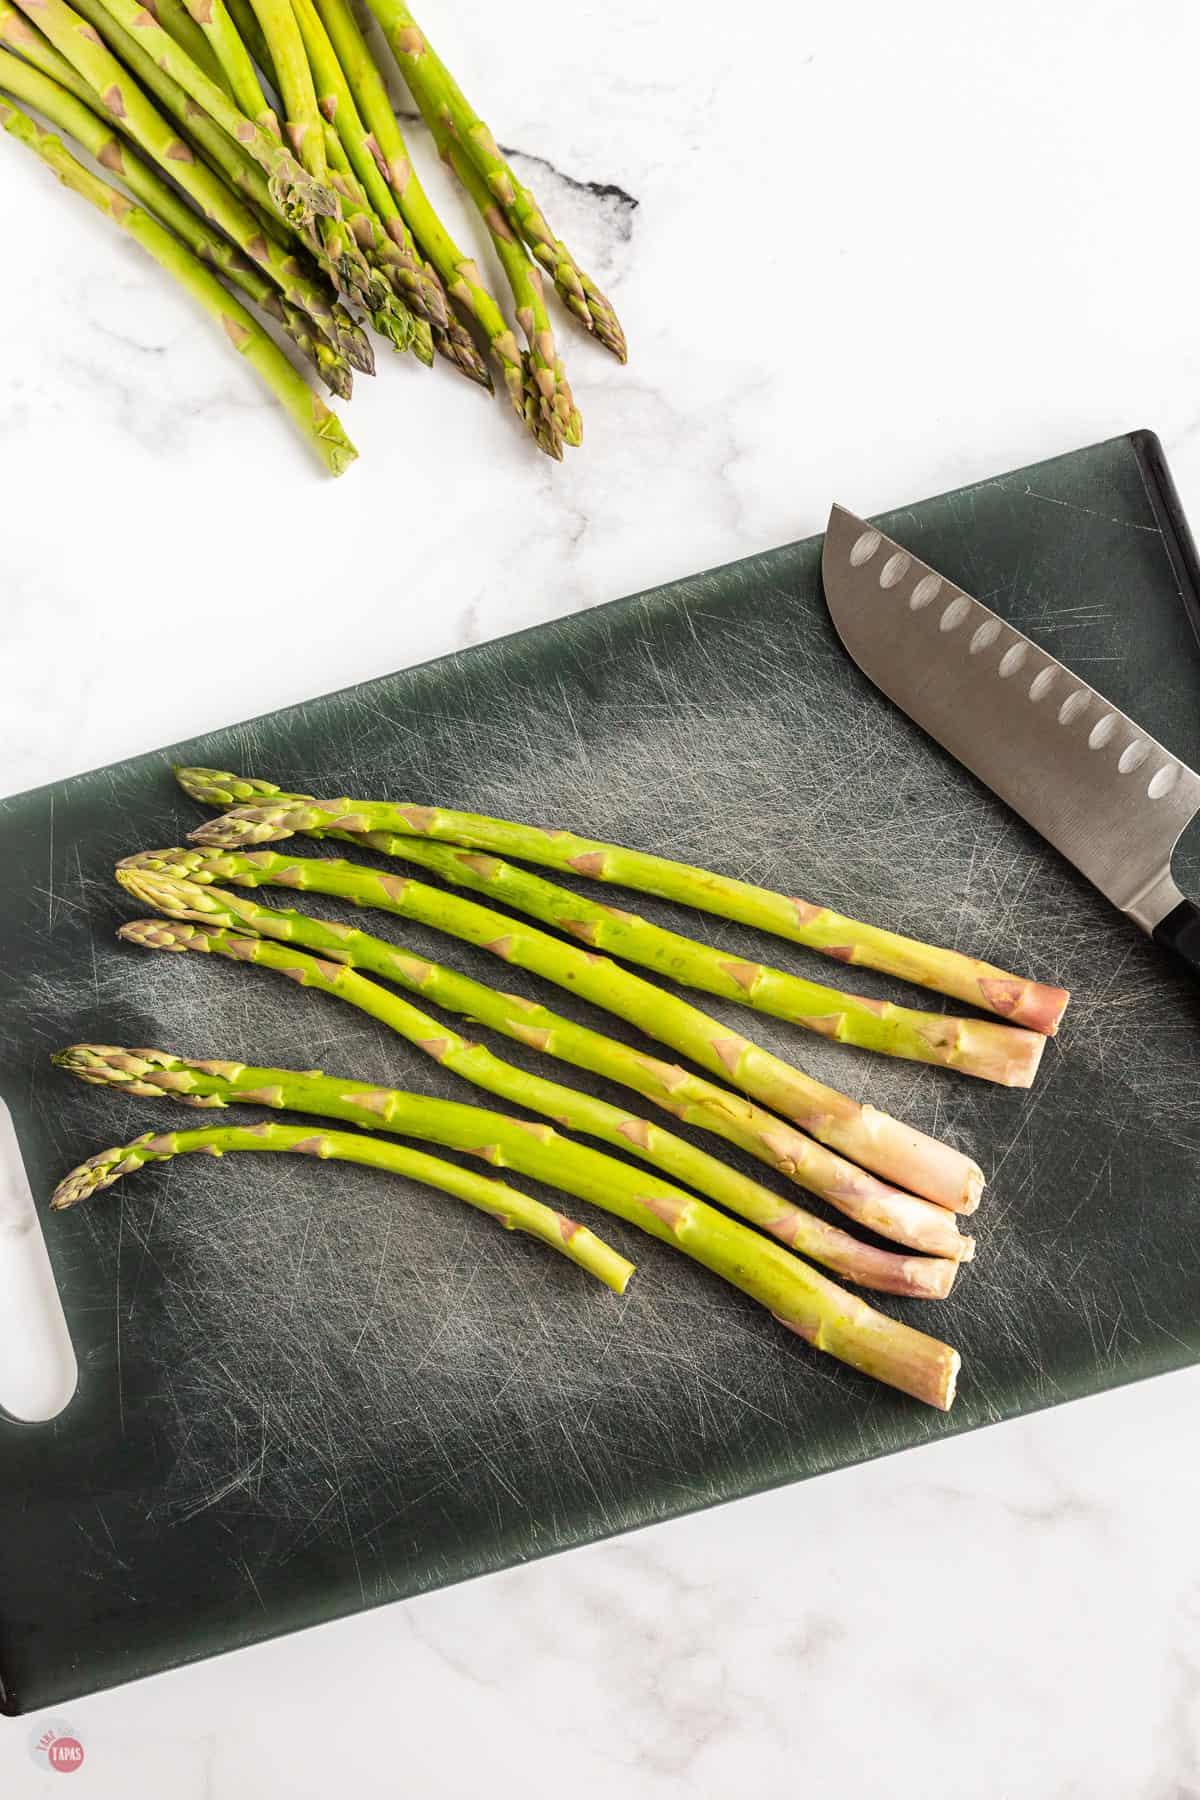 asparagus stalks on a cutting board